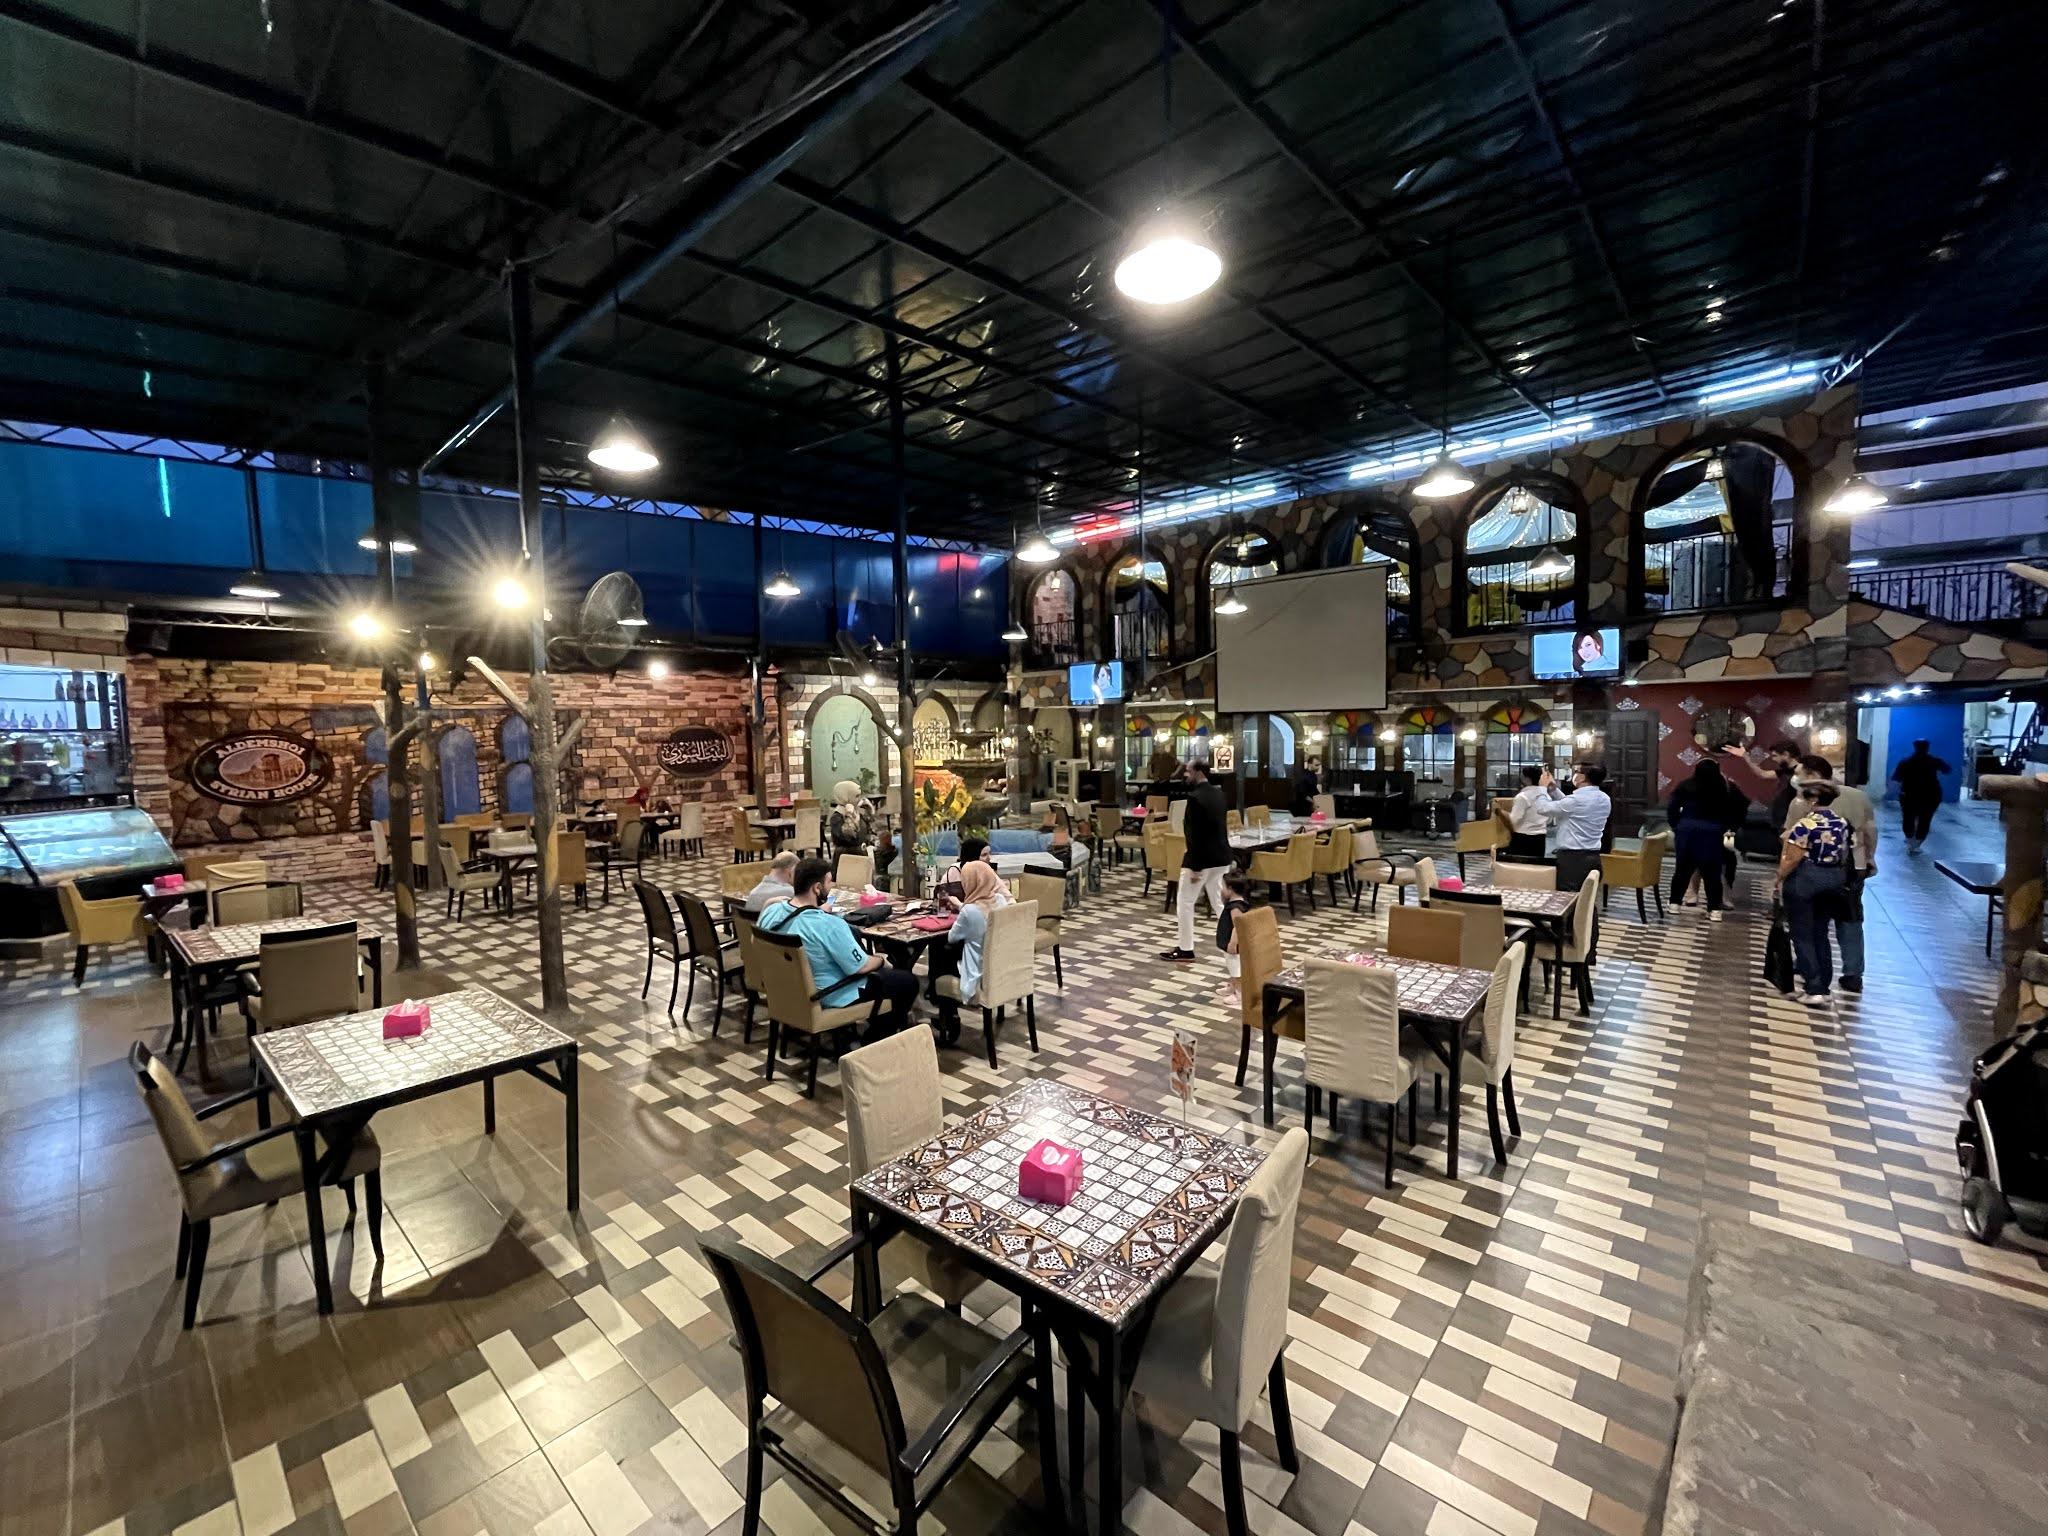 MAKAN MALAM DI SYRIAN HOUSE RESTAURANT MALAYSIA KAMPUNG BARU مطعم البيت السوري ماليزيا